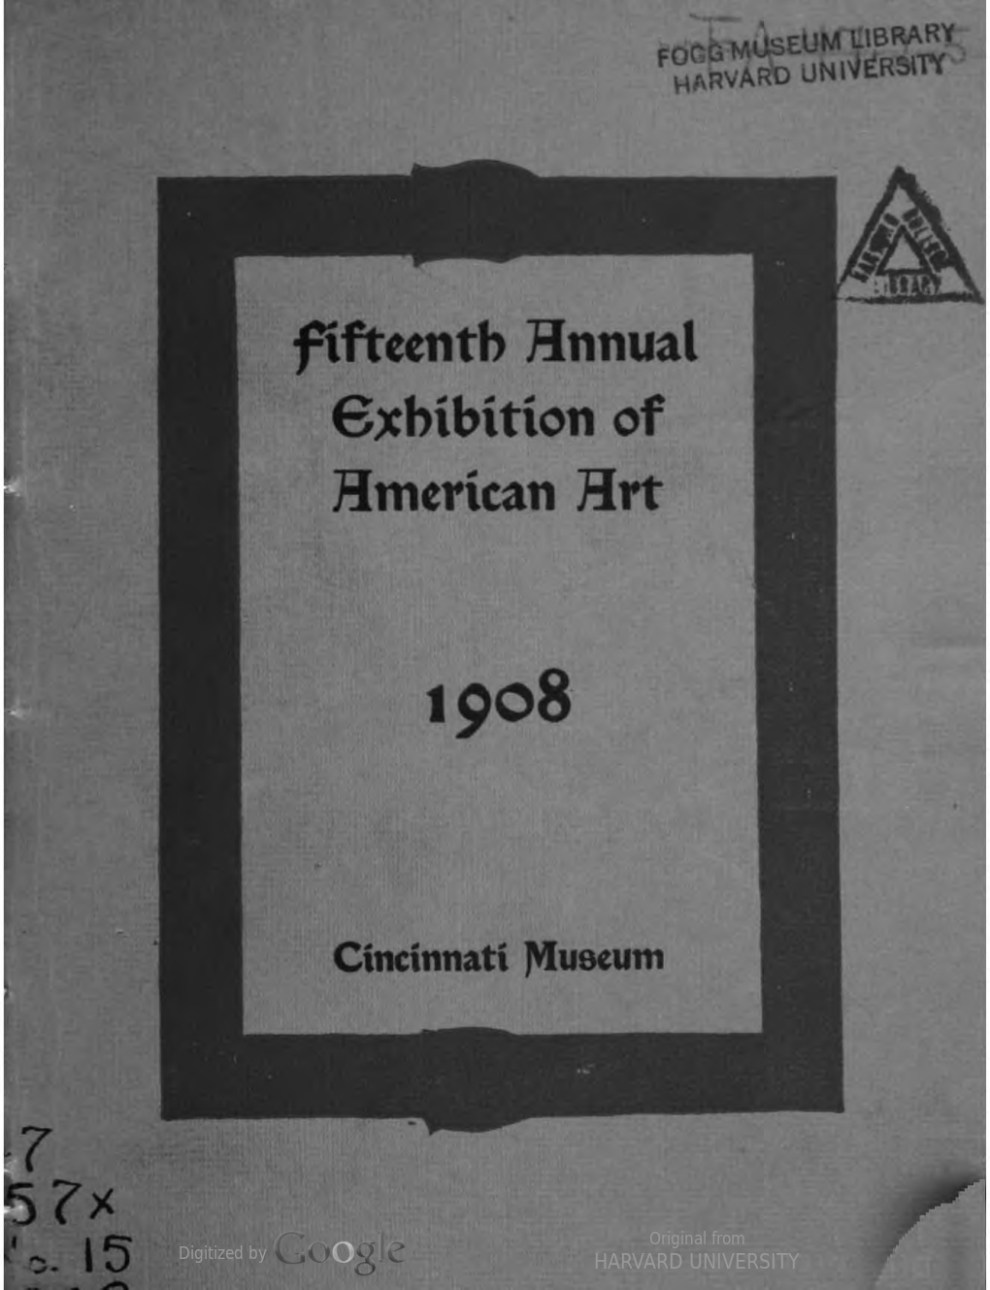 "1908 Cincinnati Museum, Cincinnati, OH, ""Fifteenth Annual Exhibition of American Art"", May 23 - July 20"